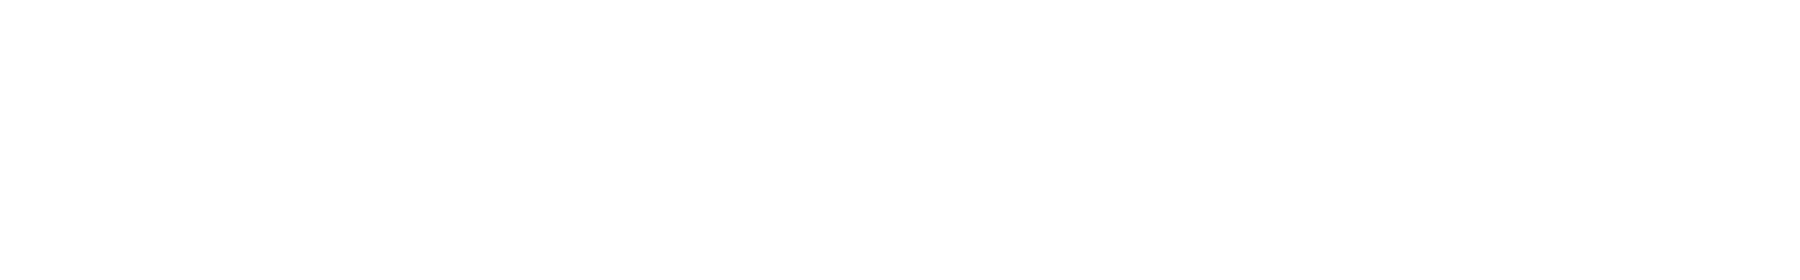 vedh sax lick 11 cm 124bpm